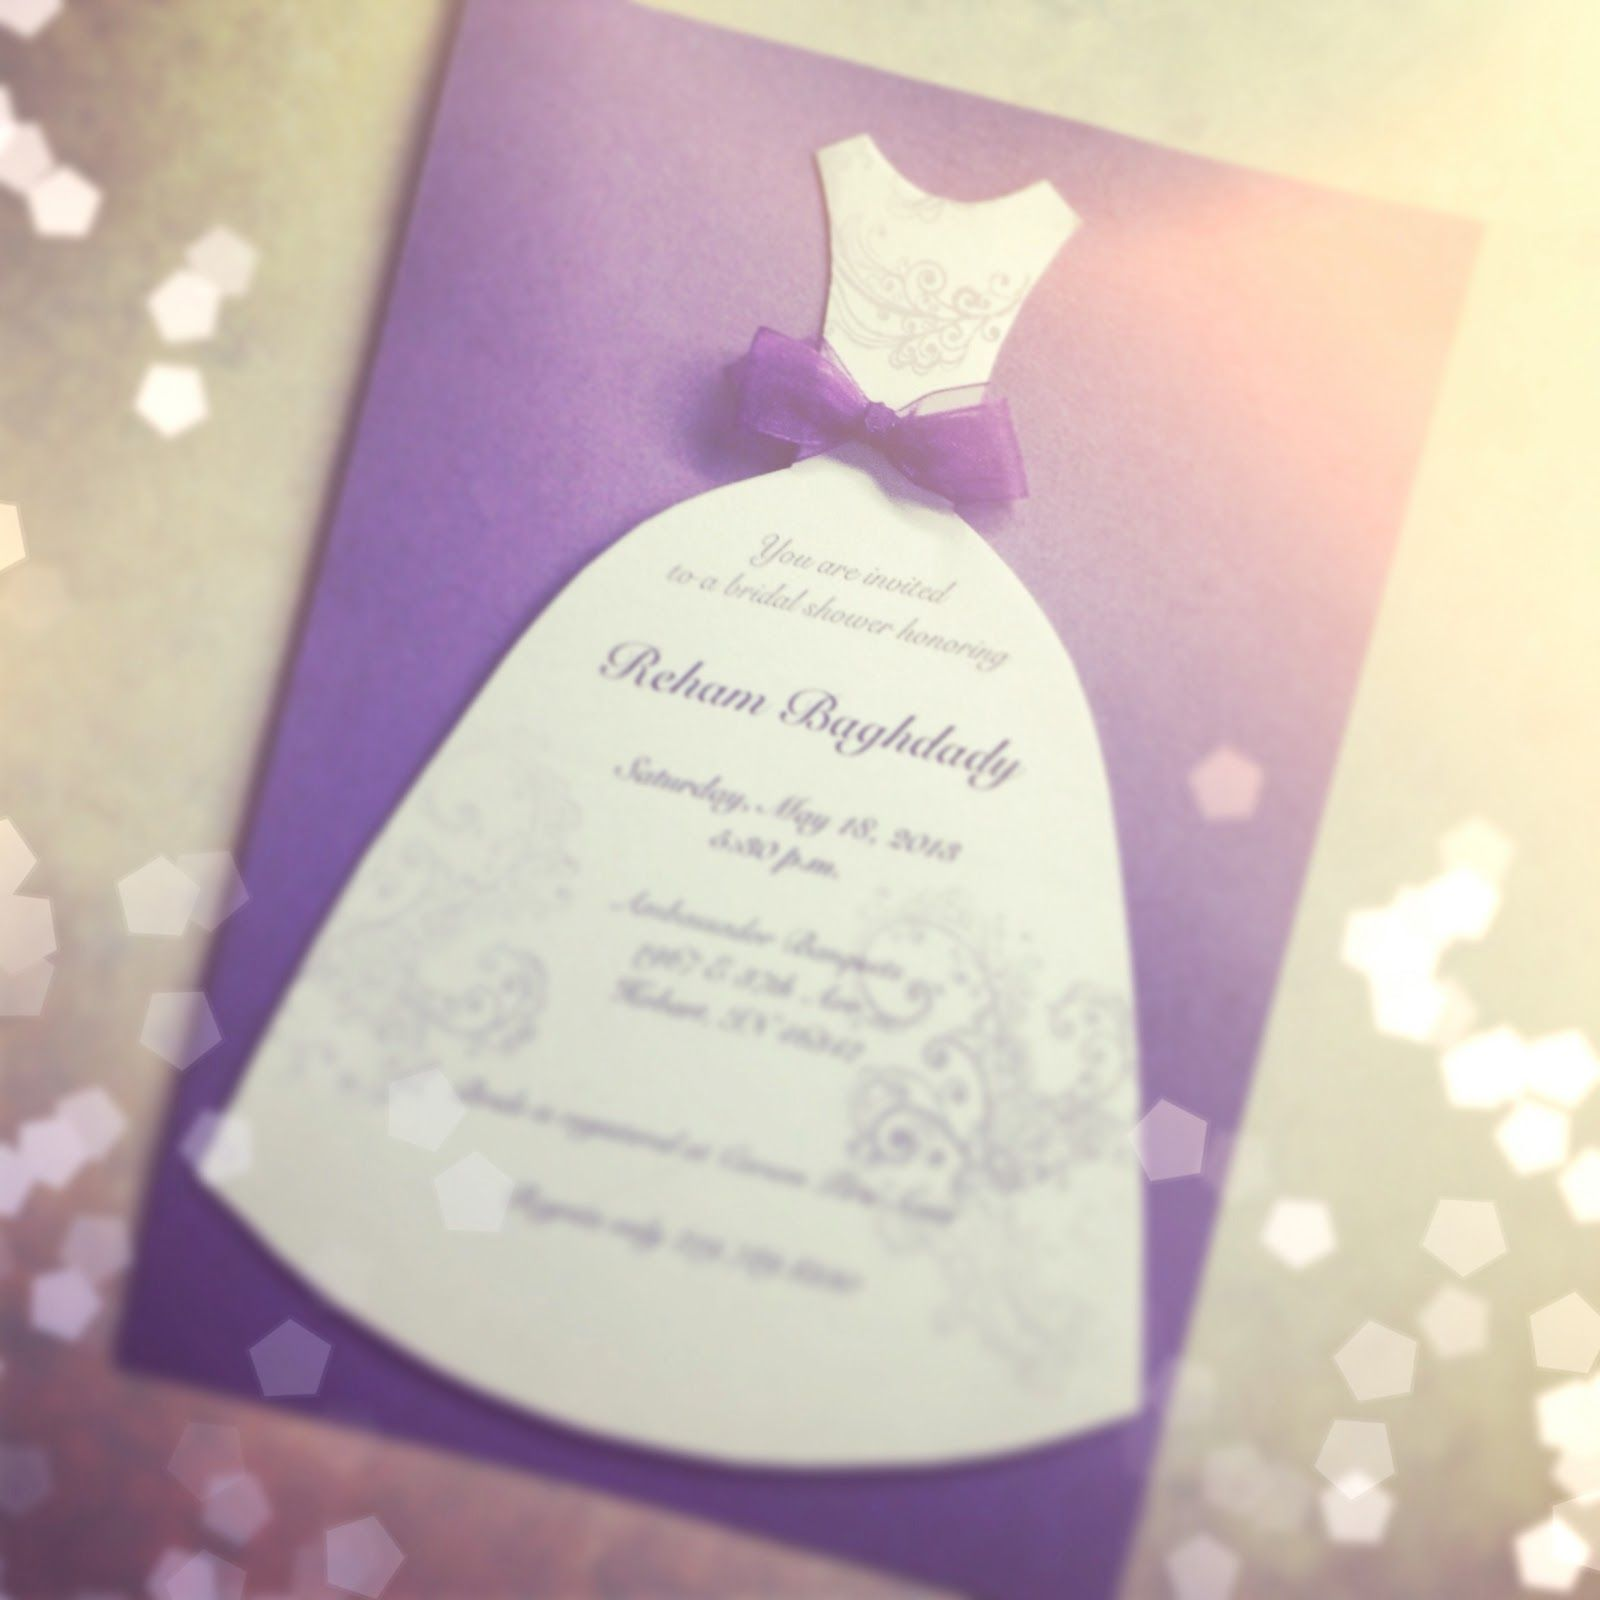 Easydiybridalshowerinvites diy bridal shower invitations easydiybridalshowerinvites diy bridal shower invitations monicamarmolfo Image collections